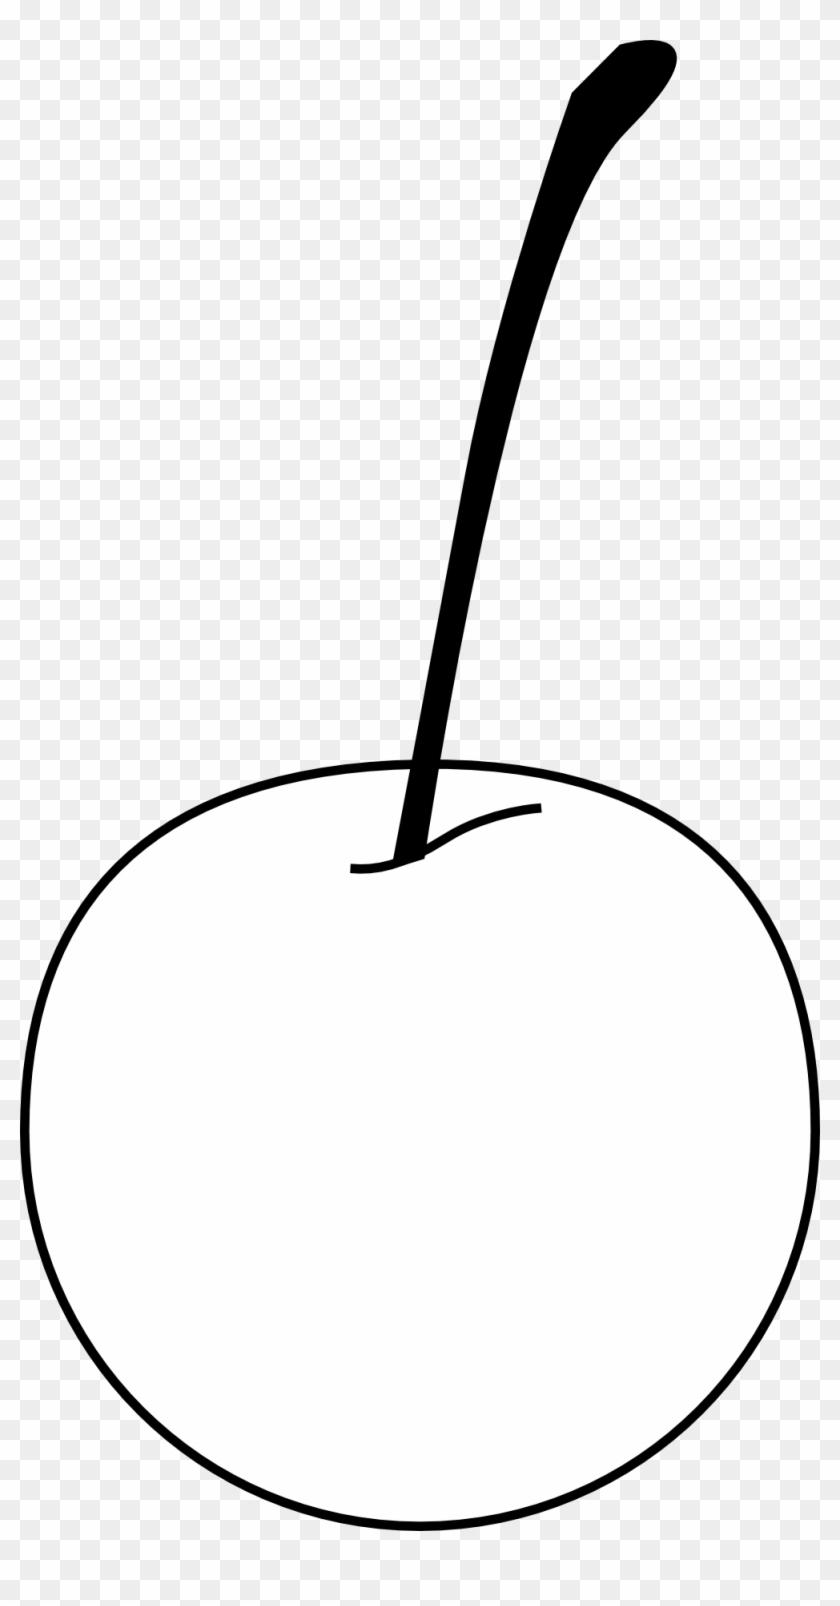 Cherry Black White Line Art 999px 60 - Apple #29664